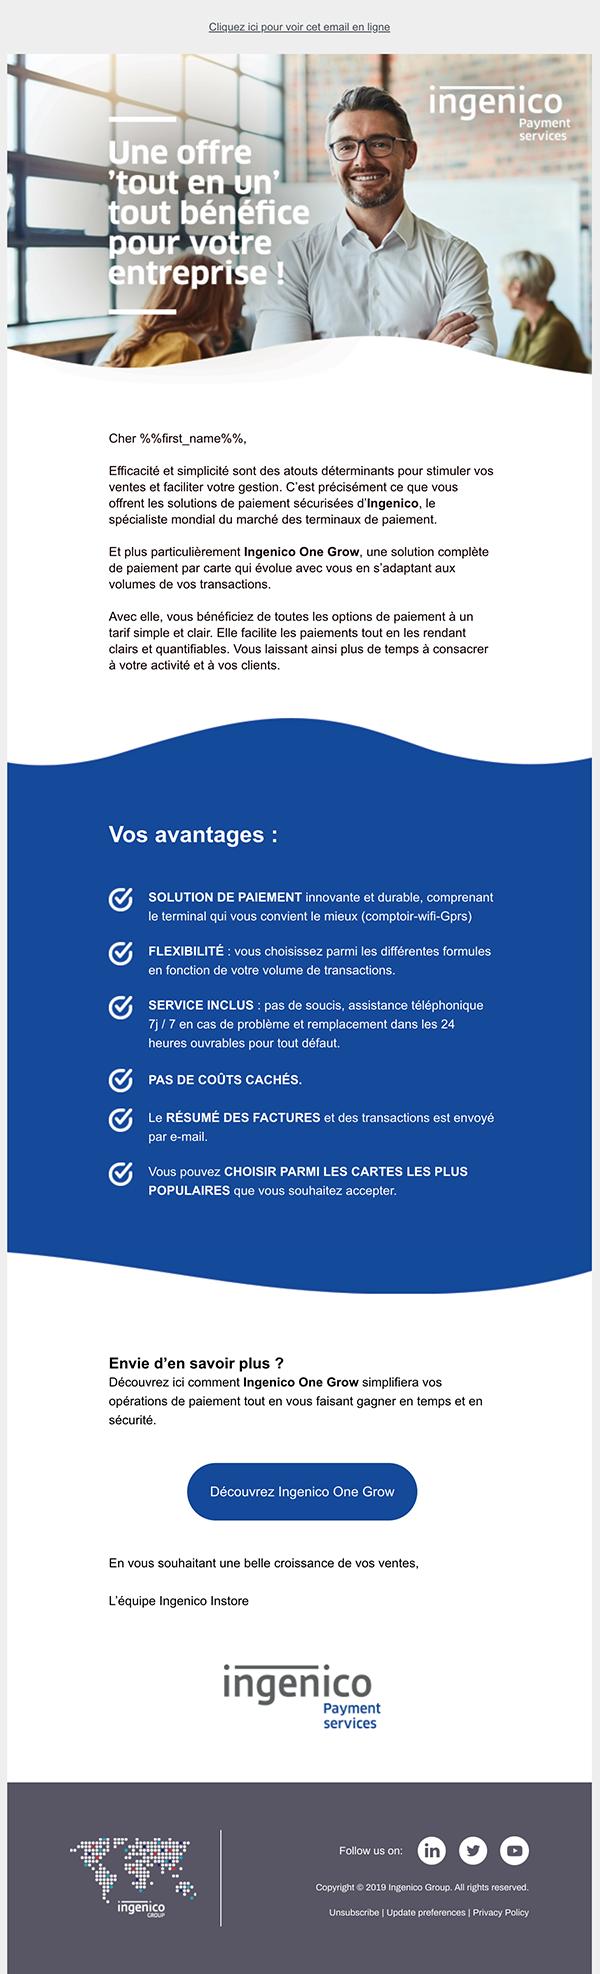 Ingenico3-html-email-template-online-panda